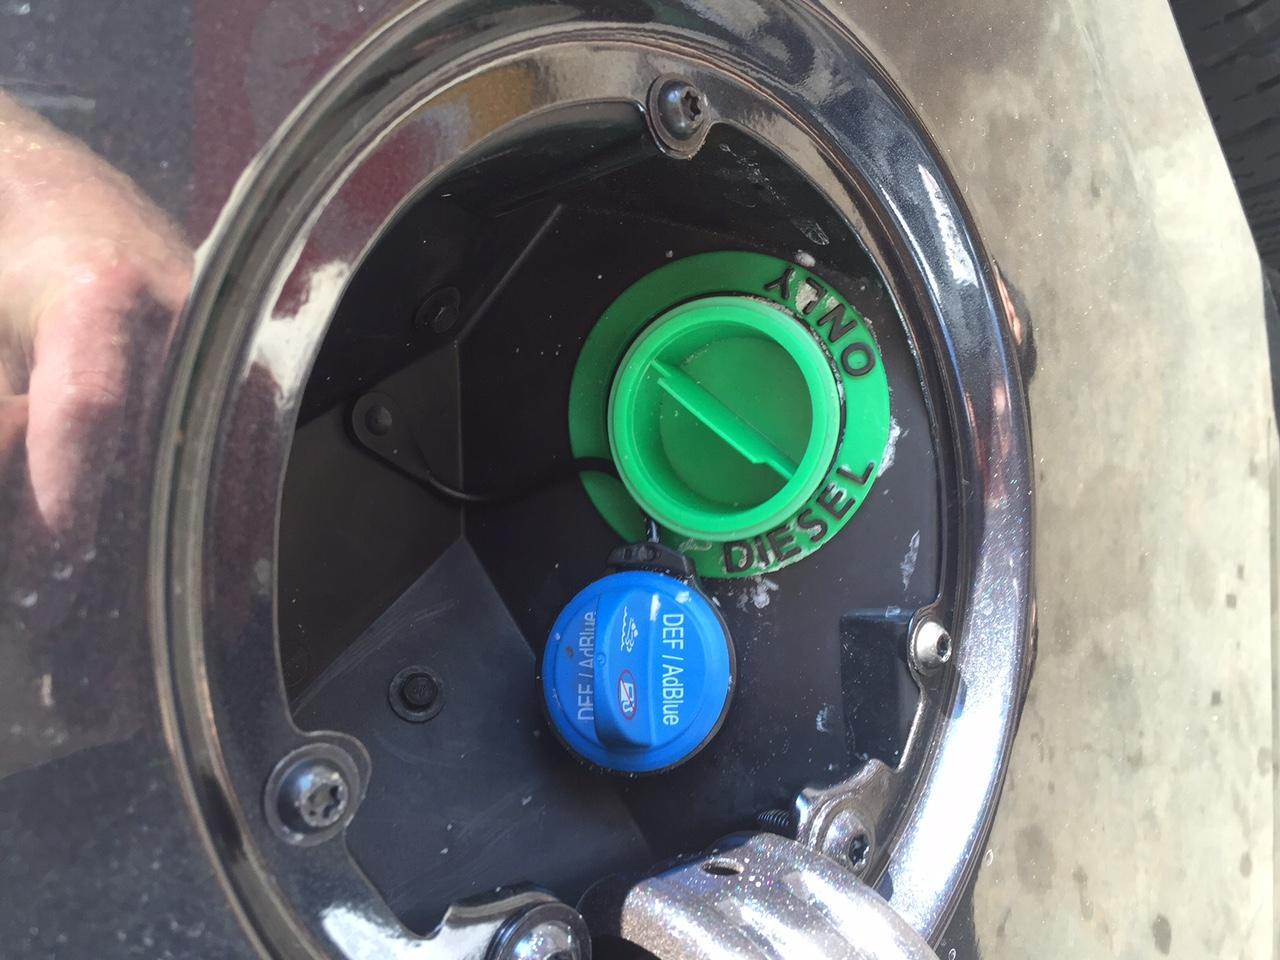 Dodge Ram 1500 Fuel Cap Wiring Diagrams Iron Man Flex Sensor Repulsor Circuit Schematic Flickr Photo Ed Gas Rh Ram1500diesel Com 2002 Capacity